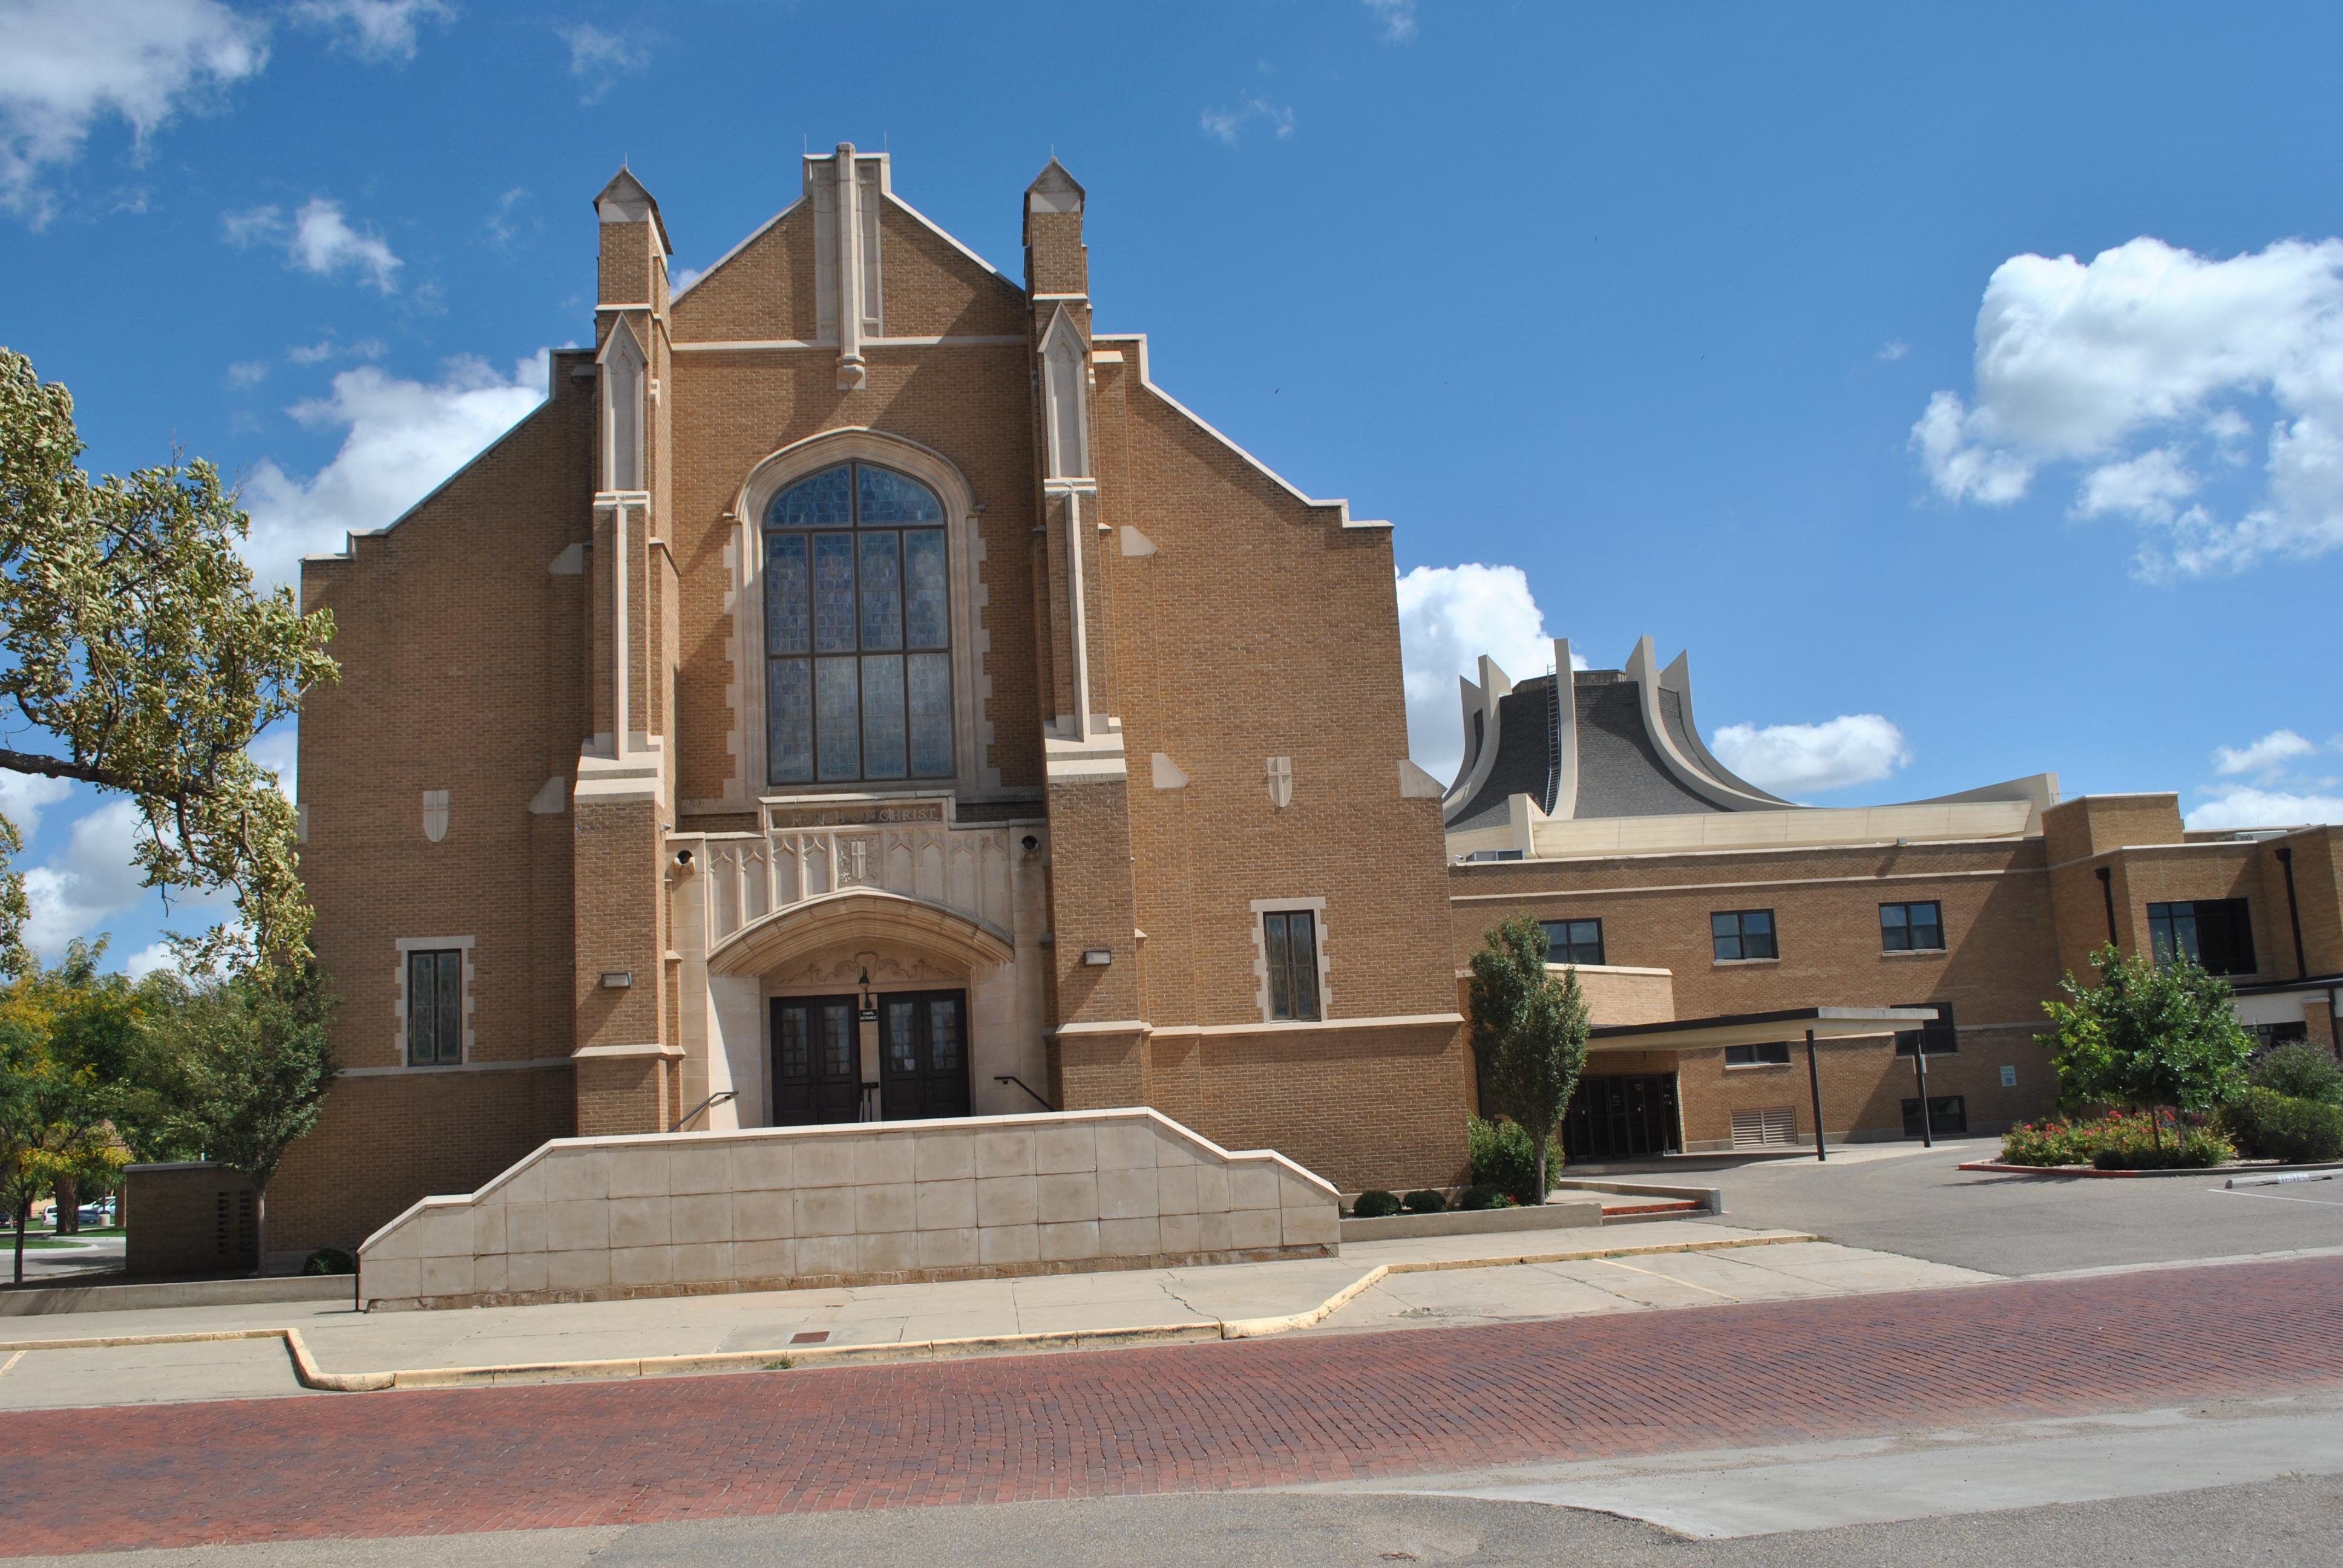 St johns episcopal church, bainbridge, gajpg